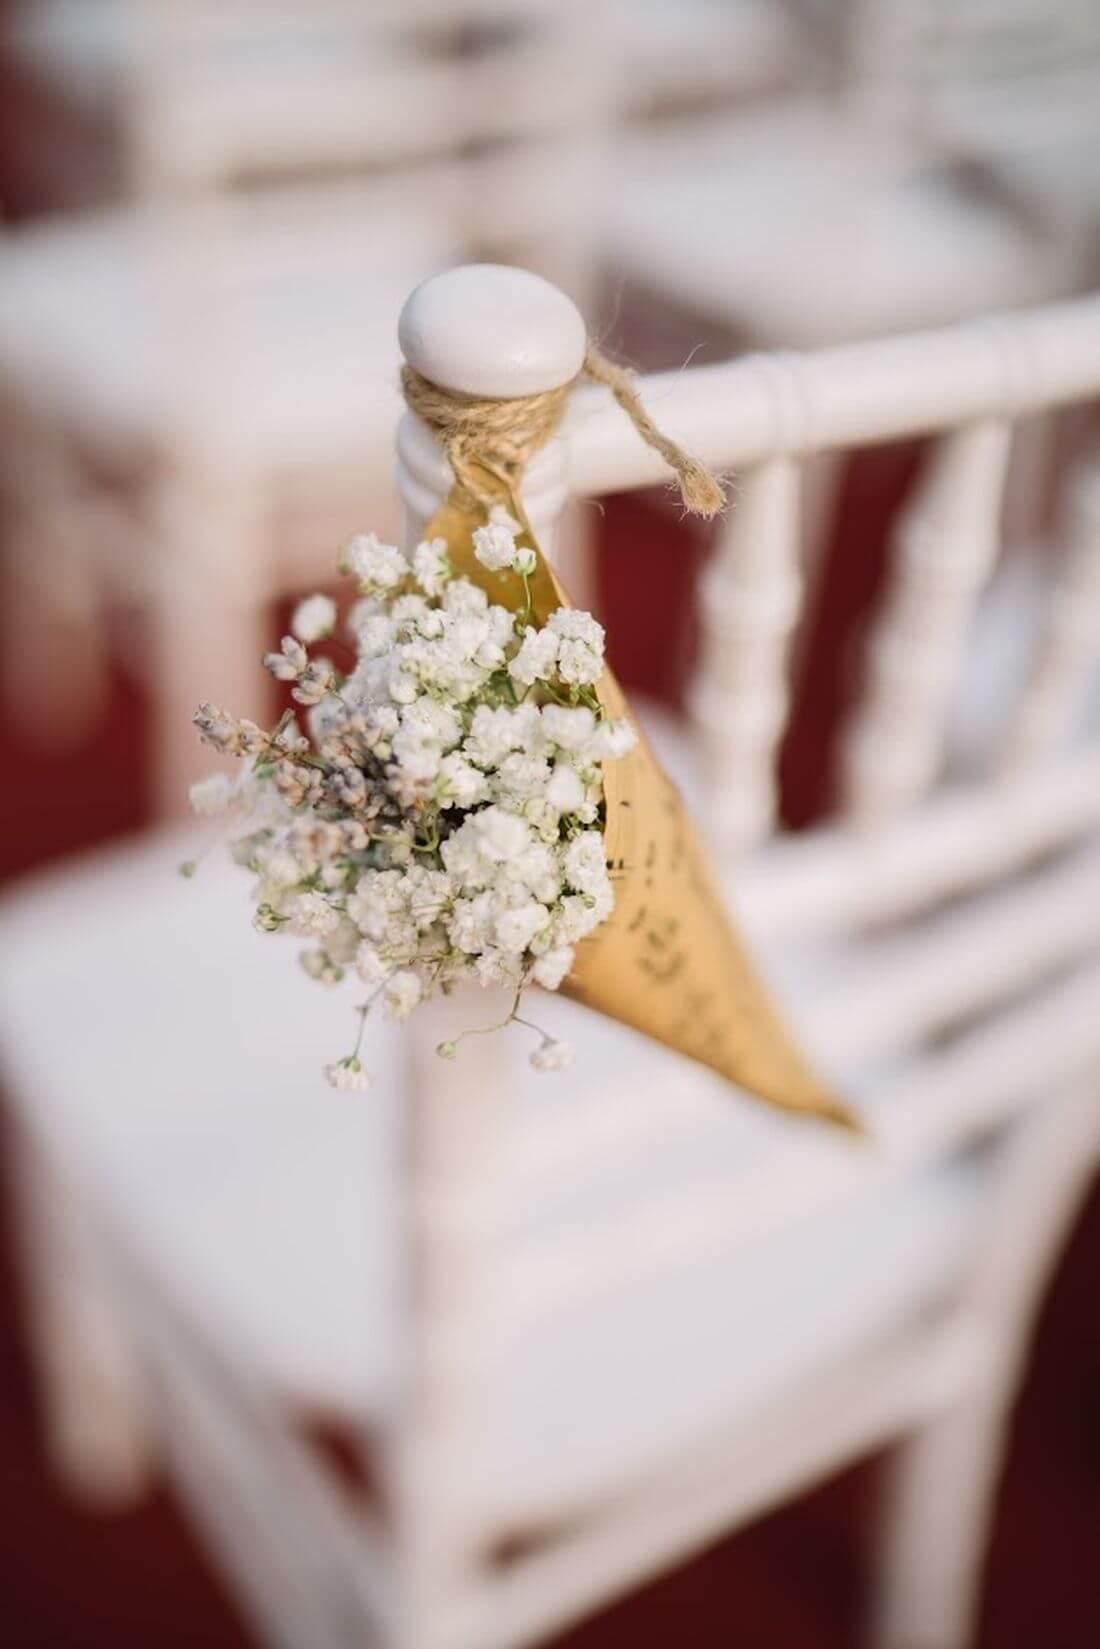 Nunta cu artificii, lavanda si muzica – Adelina si Ionut-IDO-Weddings-nuntiinaerliber (6)